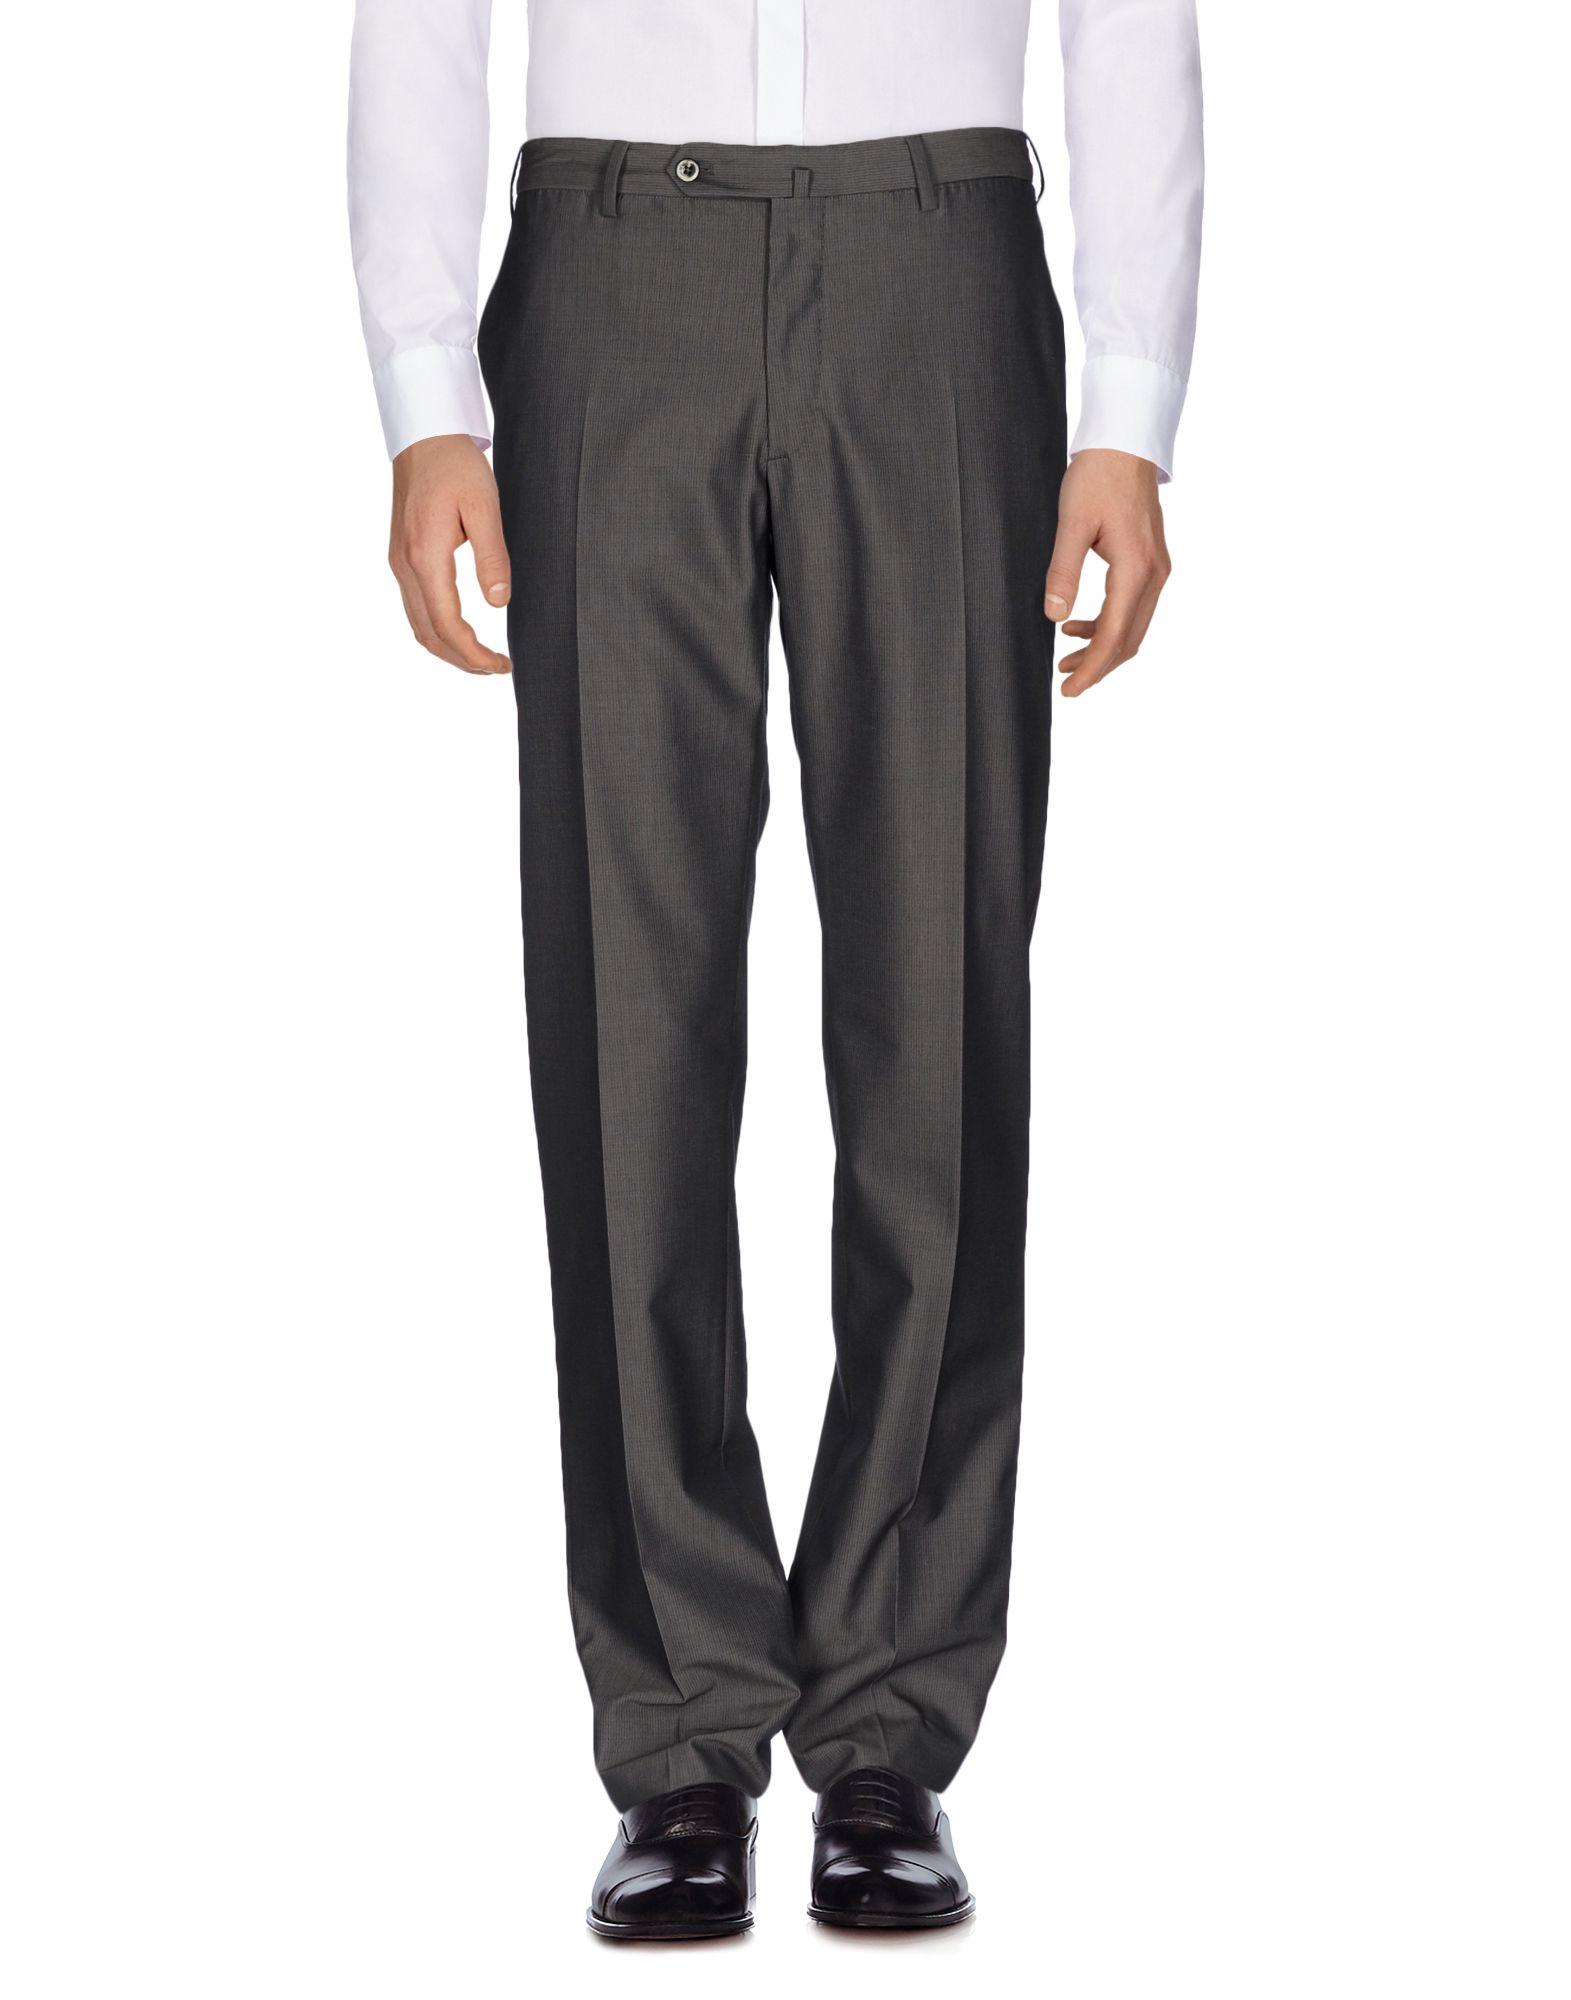 Pantalone Incotex Donna - Acquista online su